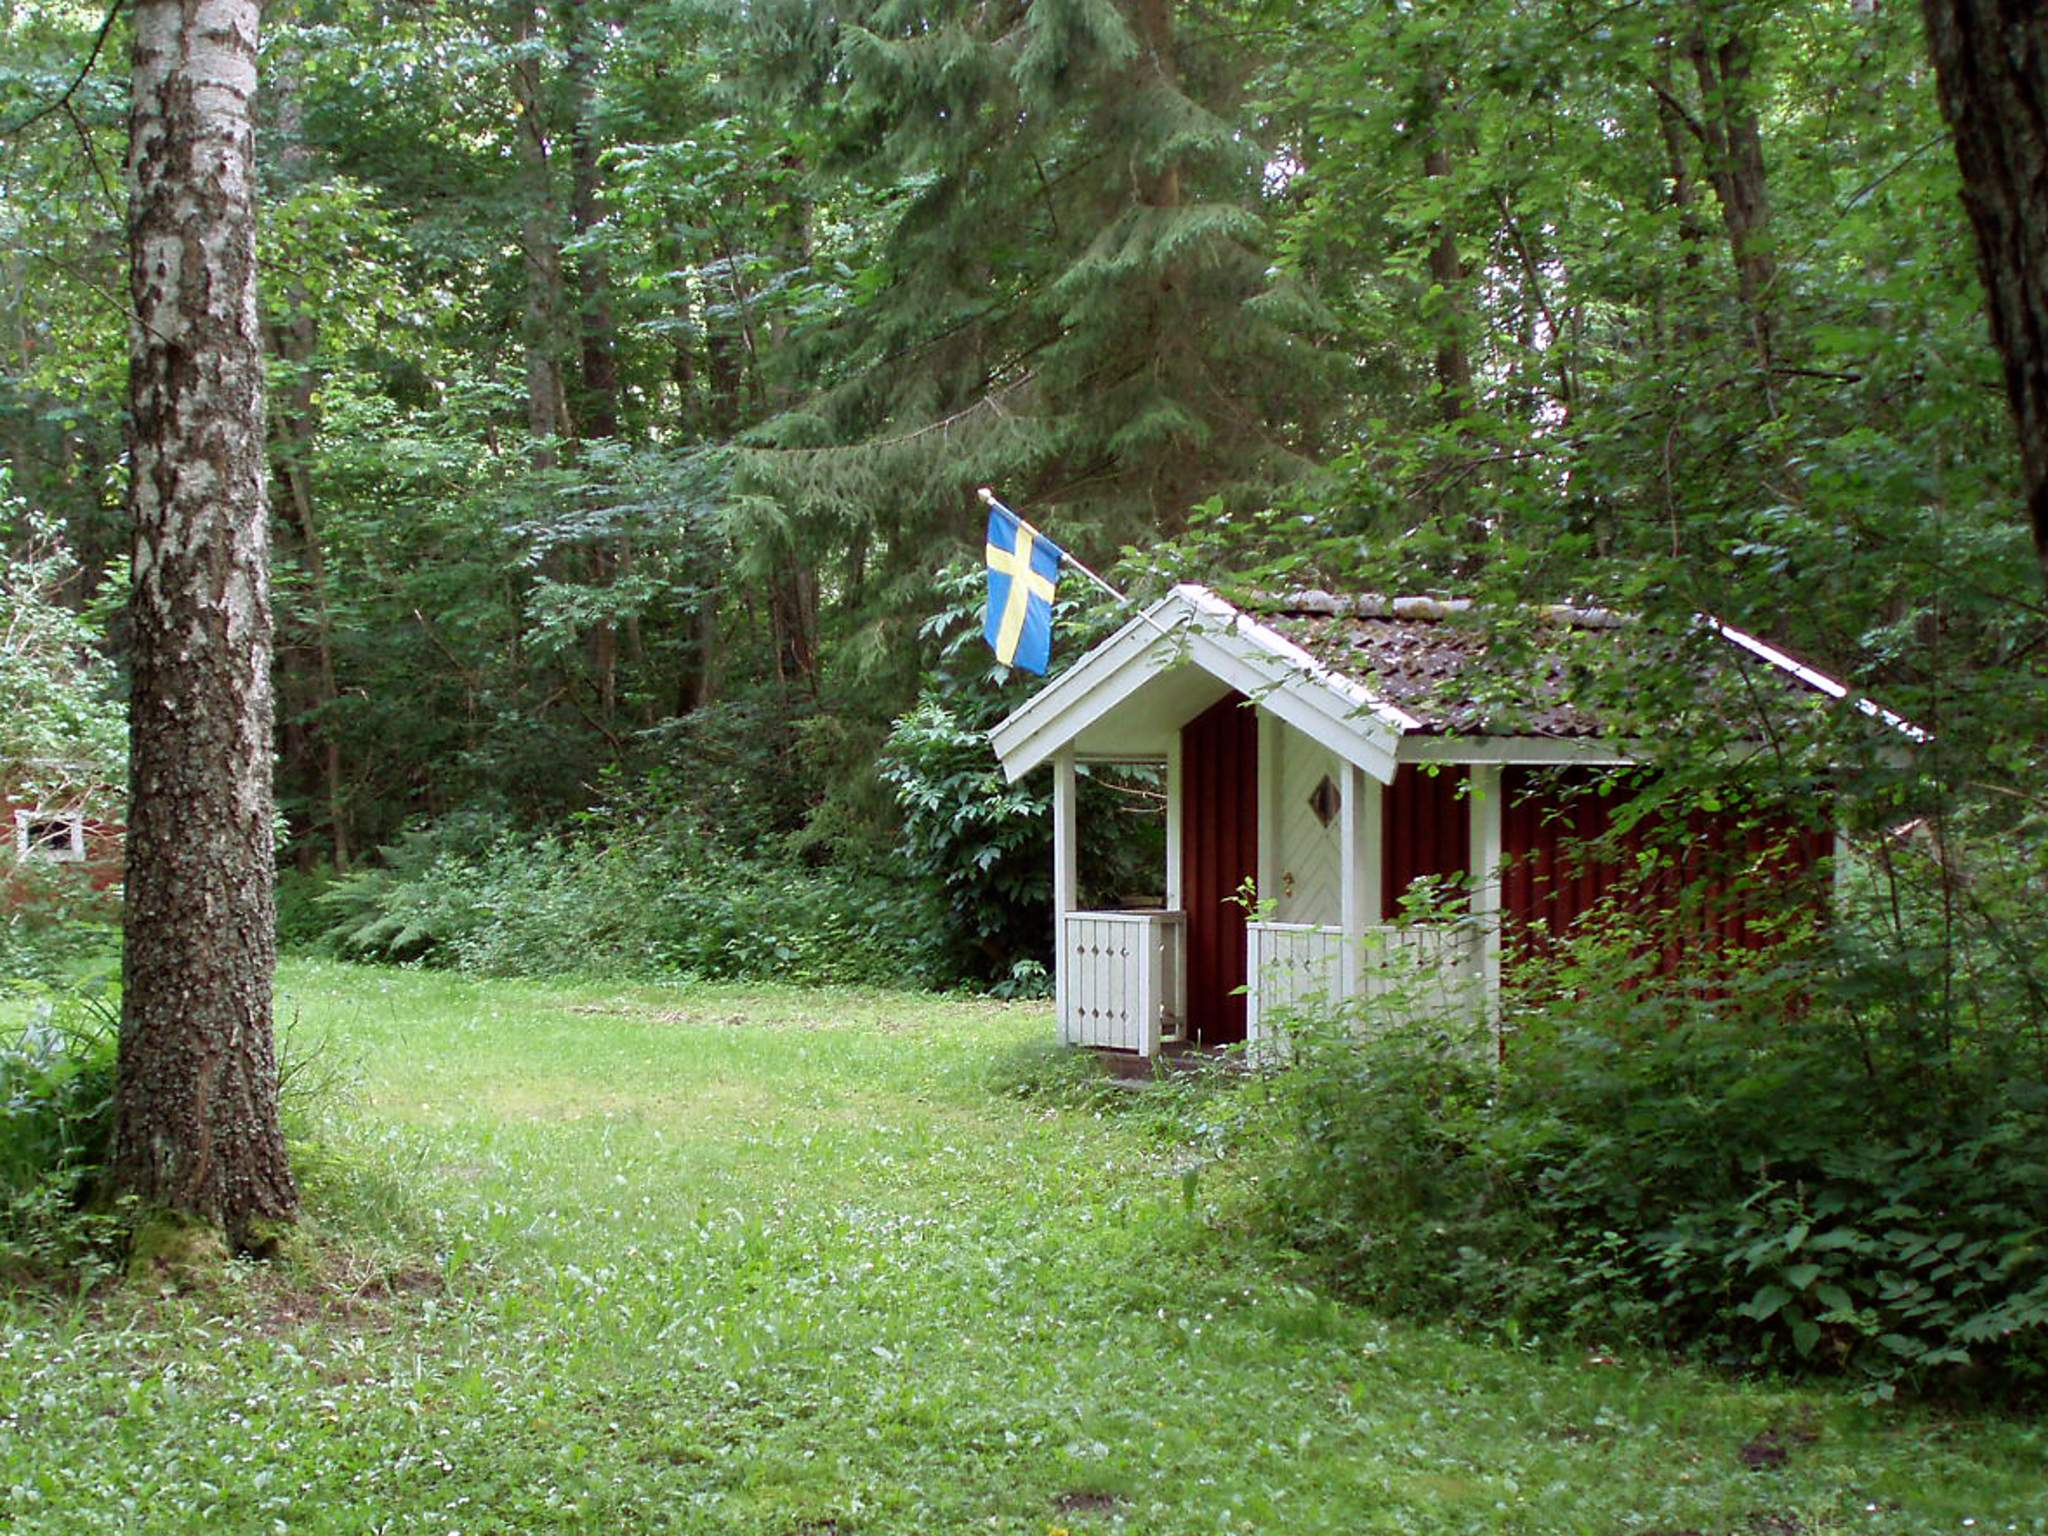 Ferienhaus Melldala (82042), Lerdala, Västra Götaland län, Westschweden, Schweden, Bild 11